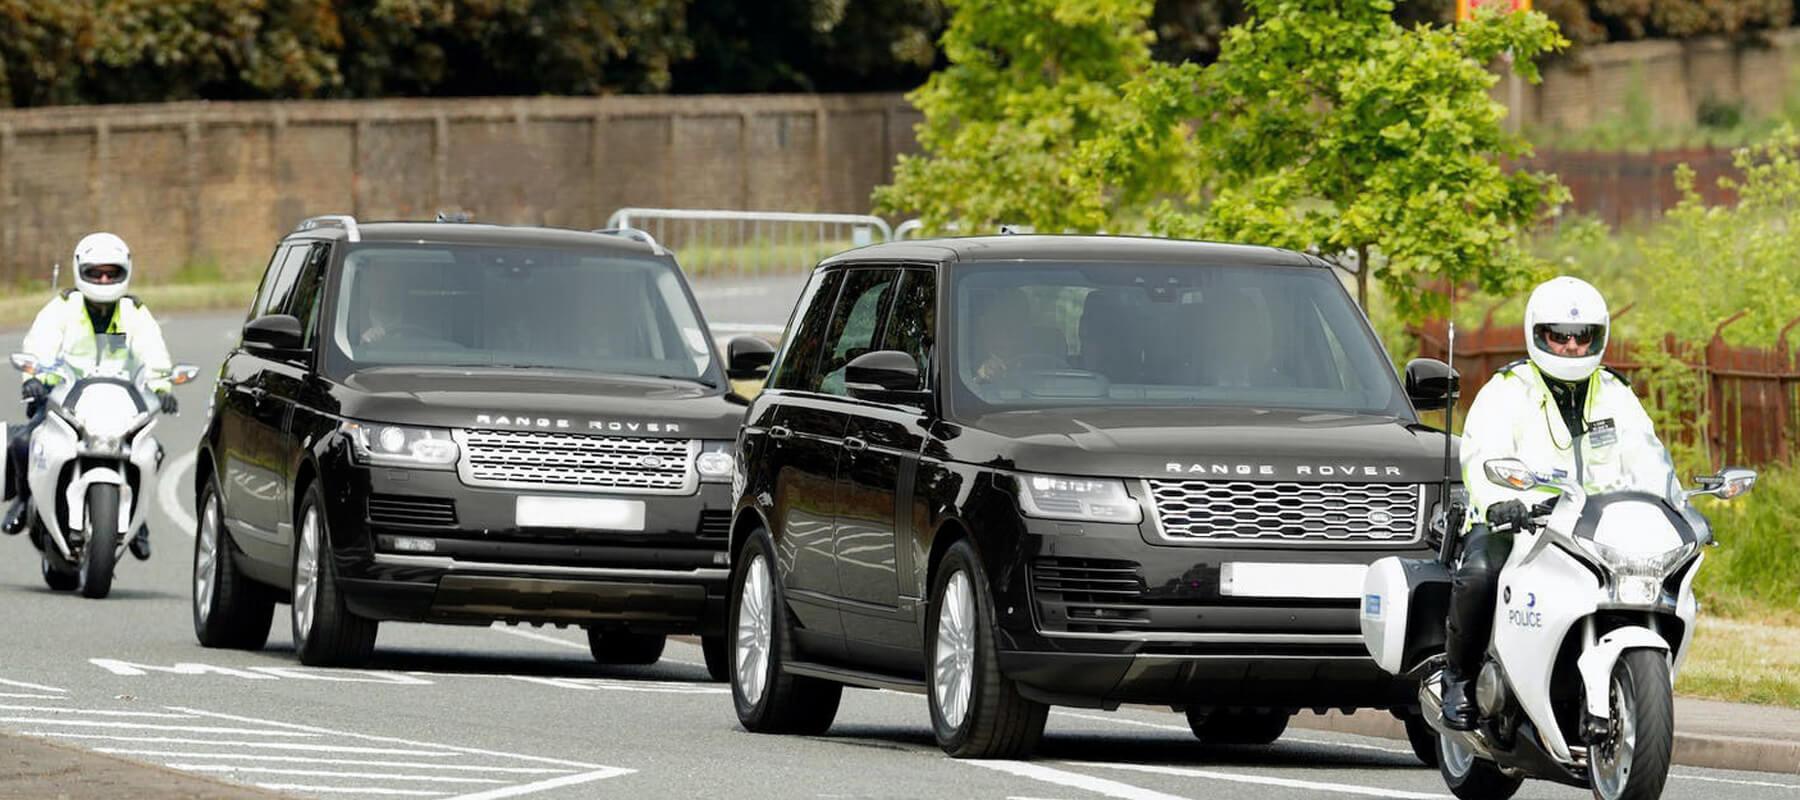 Diplomatic Chauffeur Hire